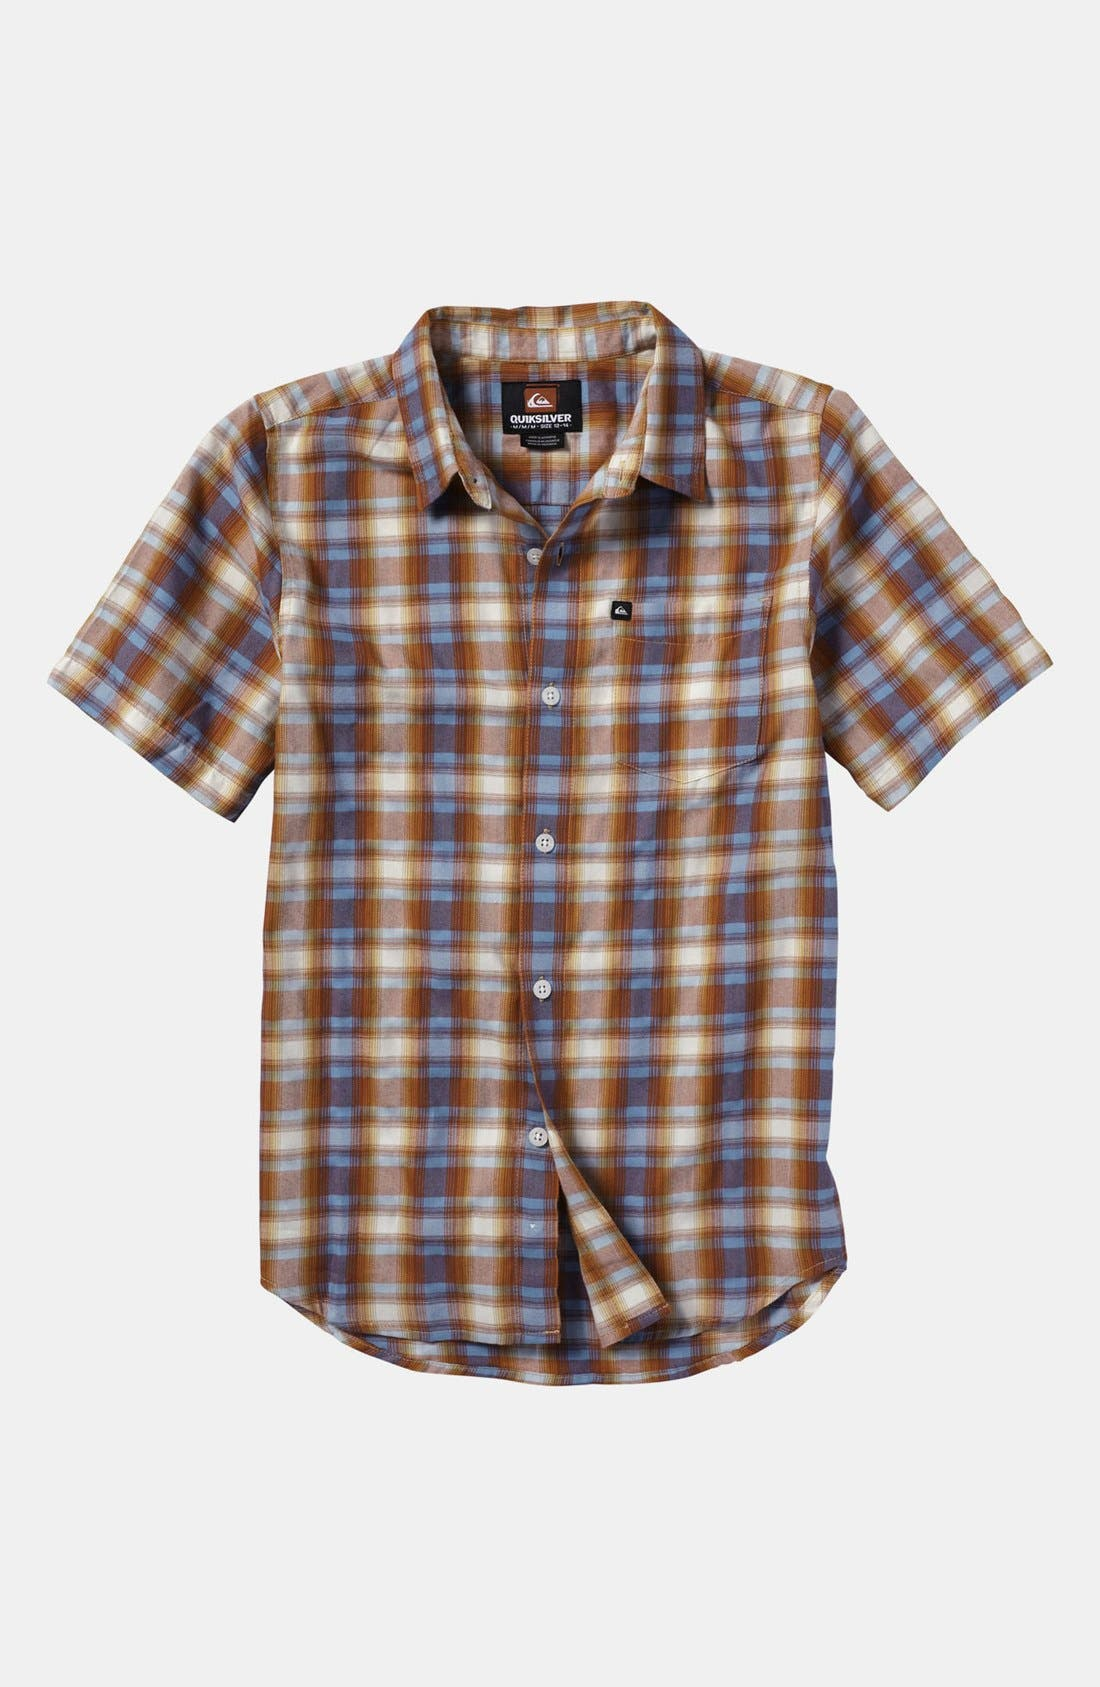 Alternate Image 1 Selected - Quiksilver 'Flash Surf' Woven Shirt (Toddler)